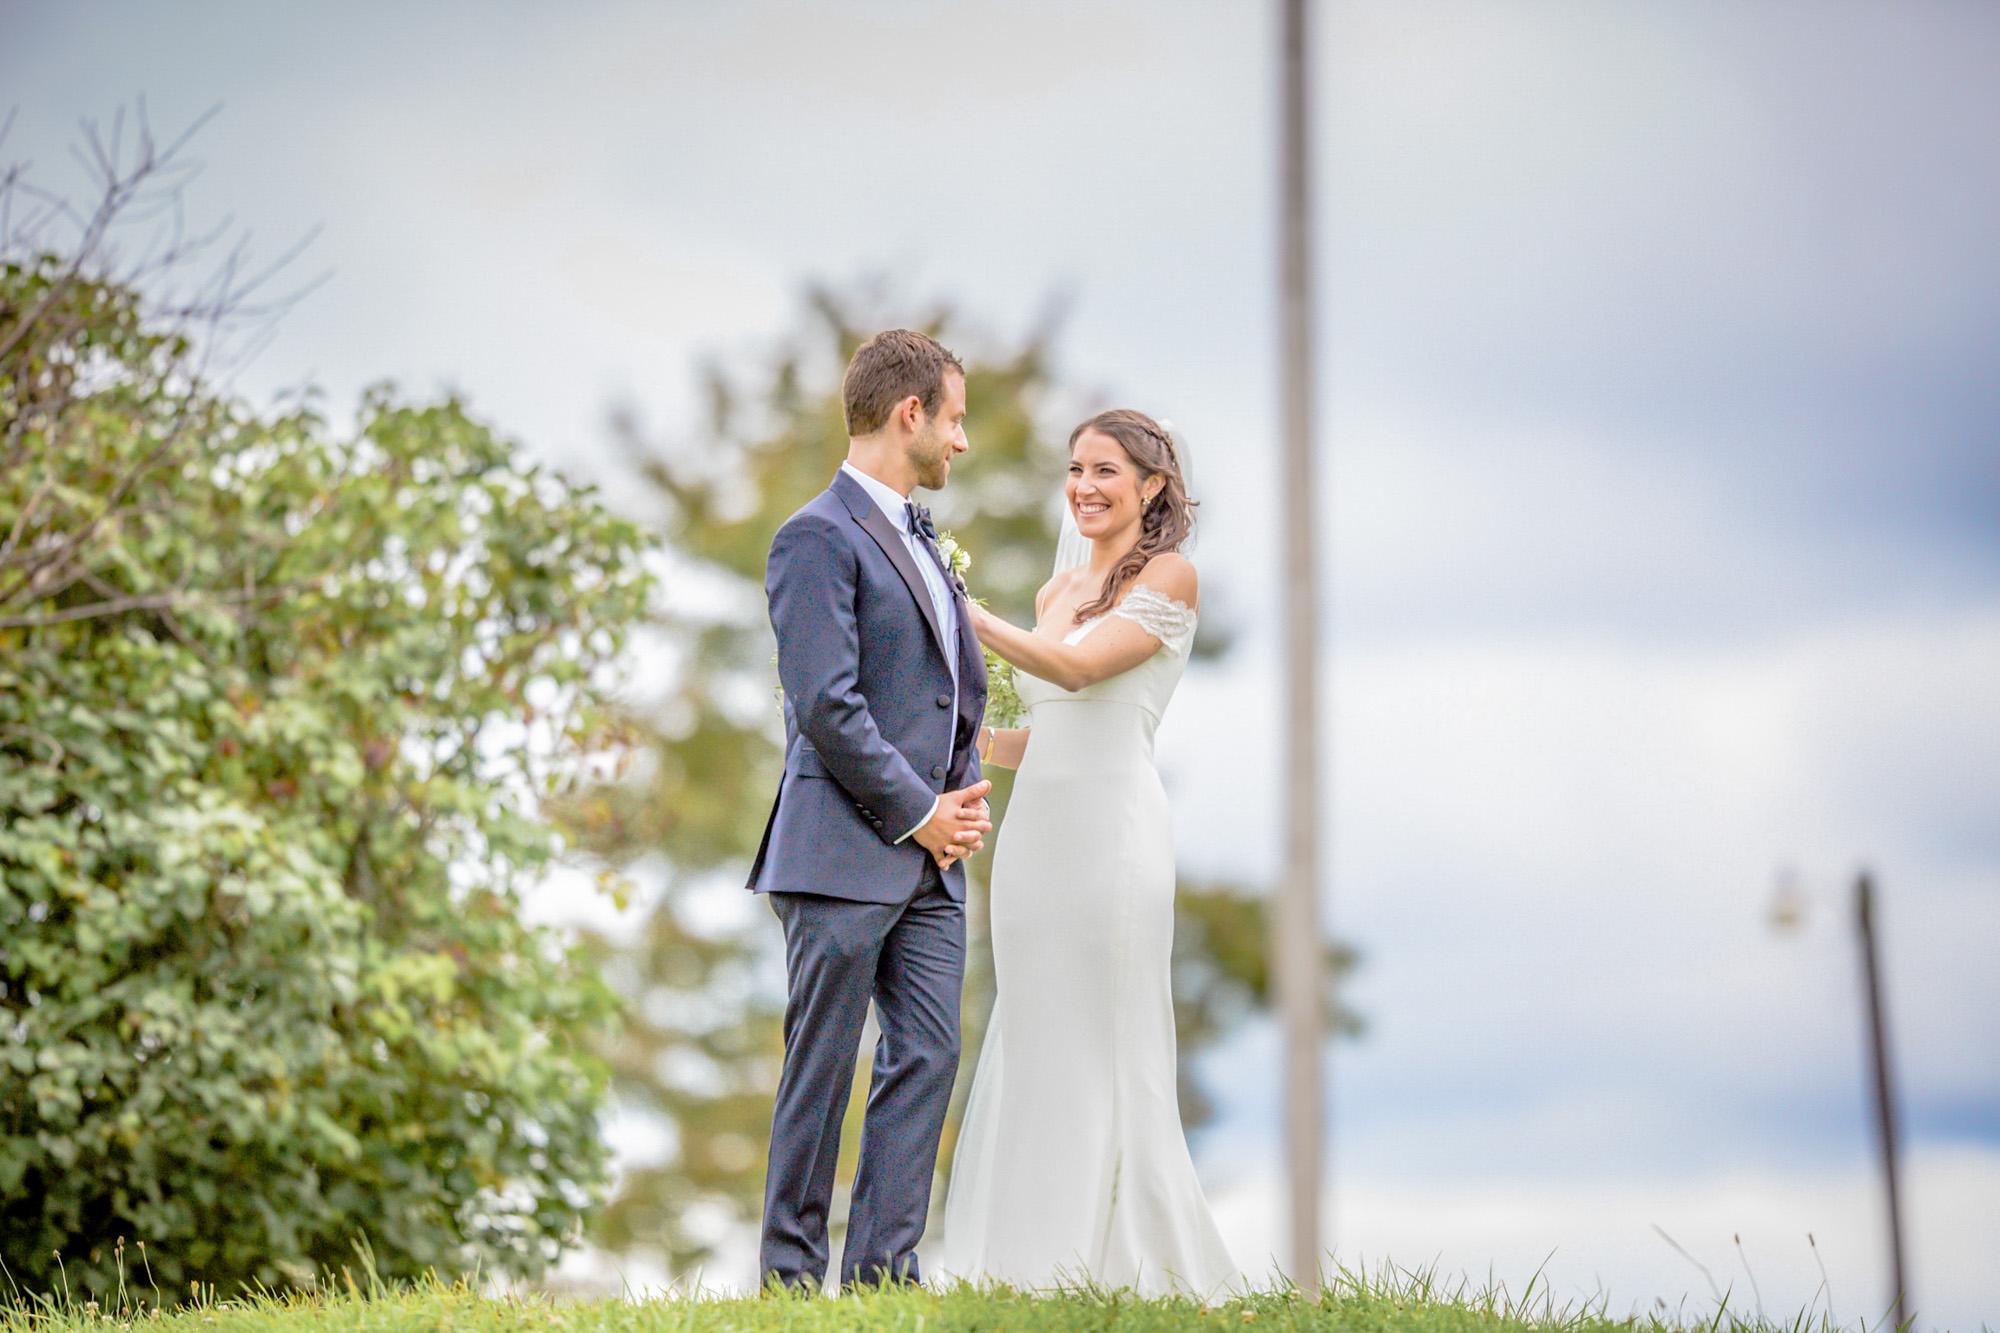 scranton_wedding_photographer_lettieri_pa (13 of 34).jpg